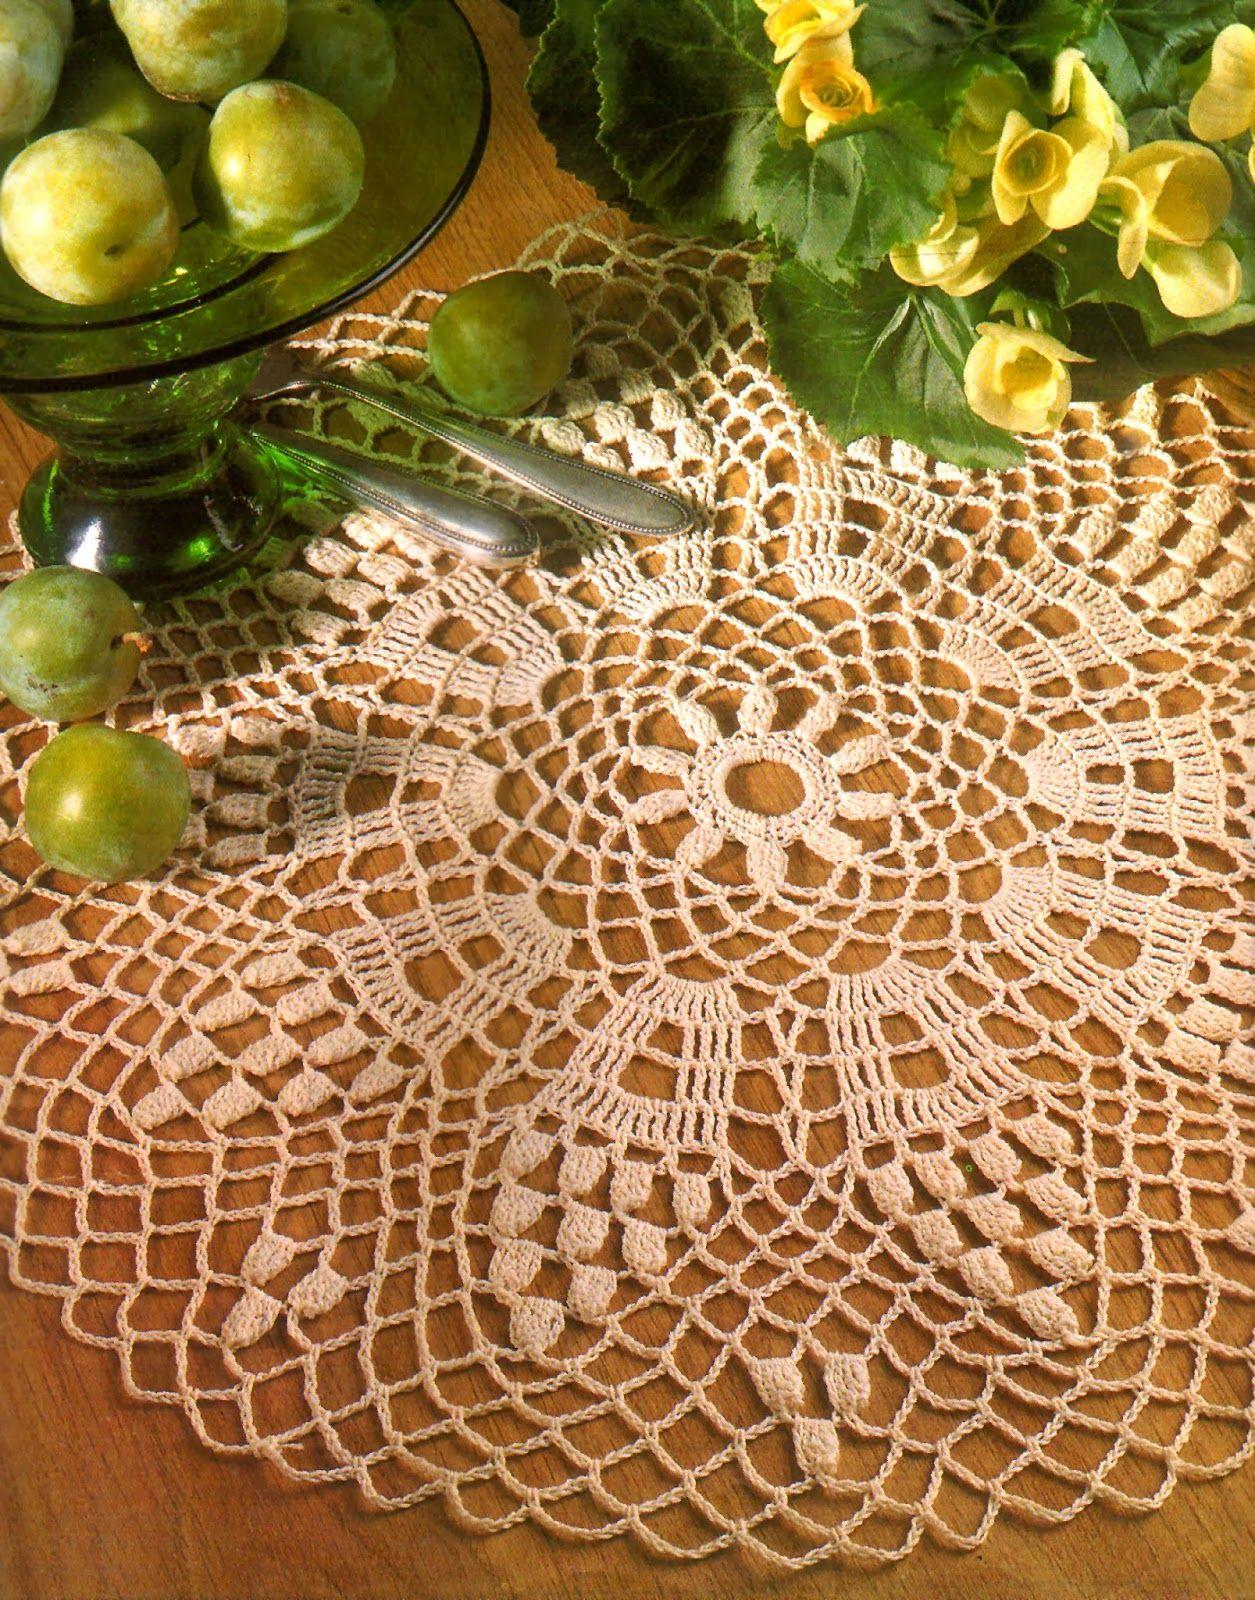 tejidos artesanales: carpeta reina claudia